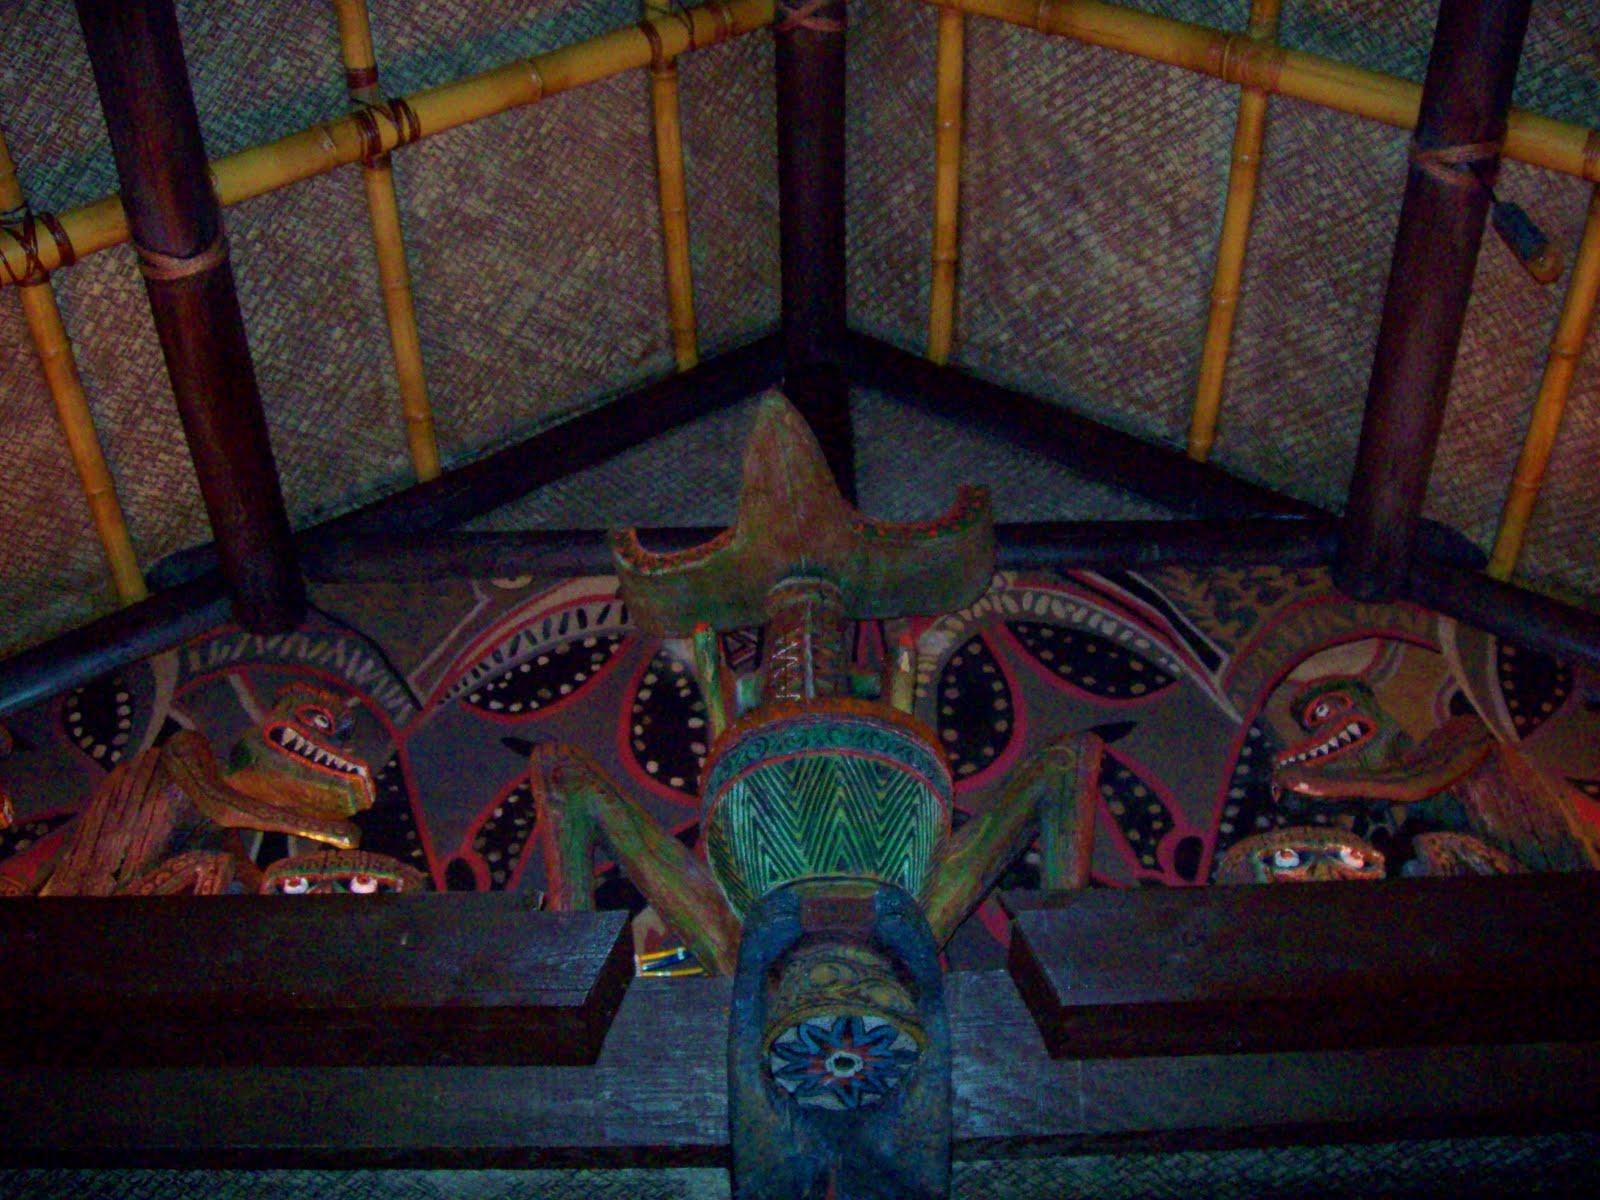 Disney Vacation Kingdom Walt Disneys Enchanted Tiki Room